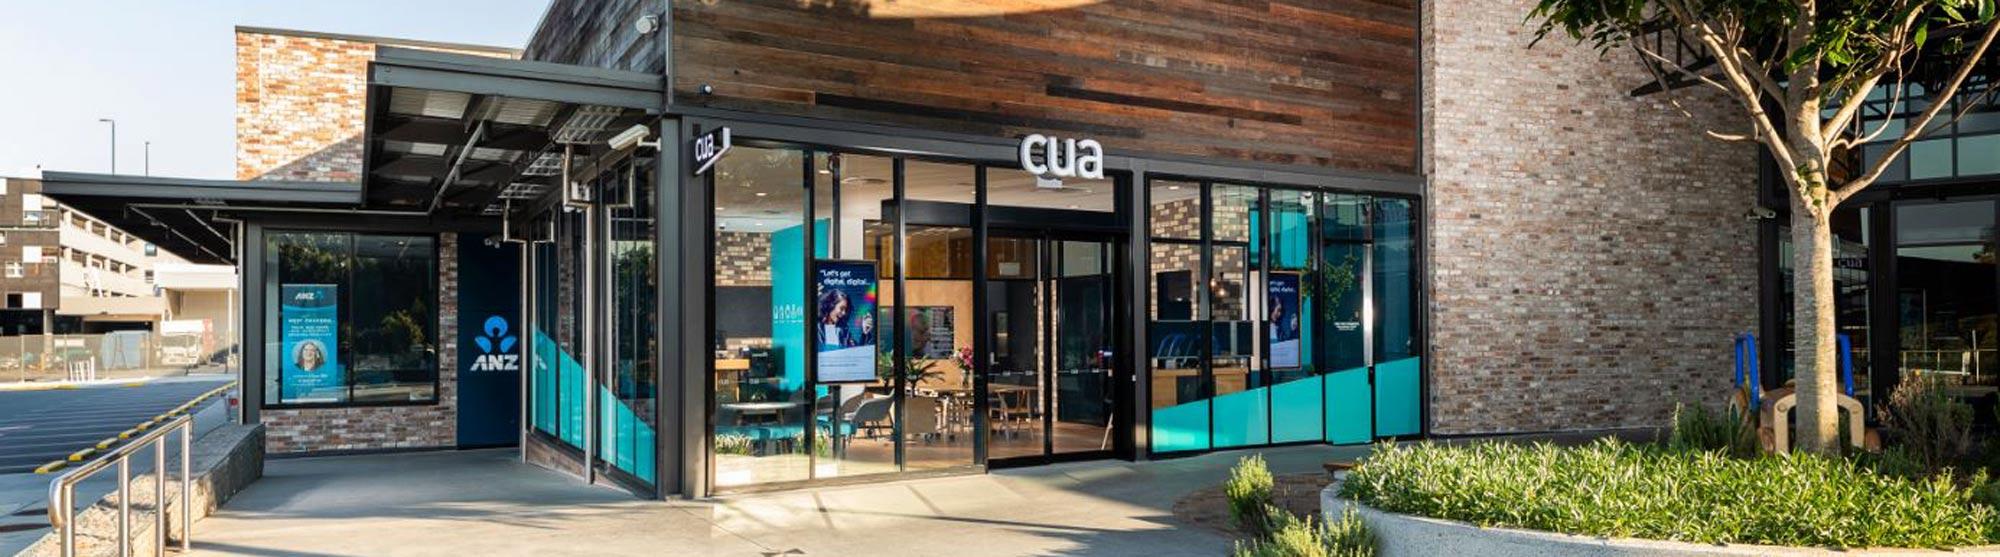 Exterior of the CUA community hub